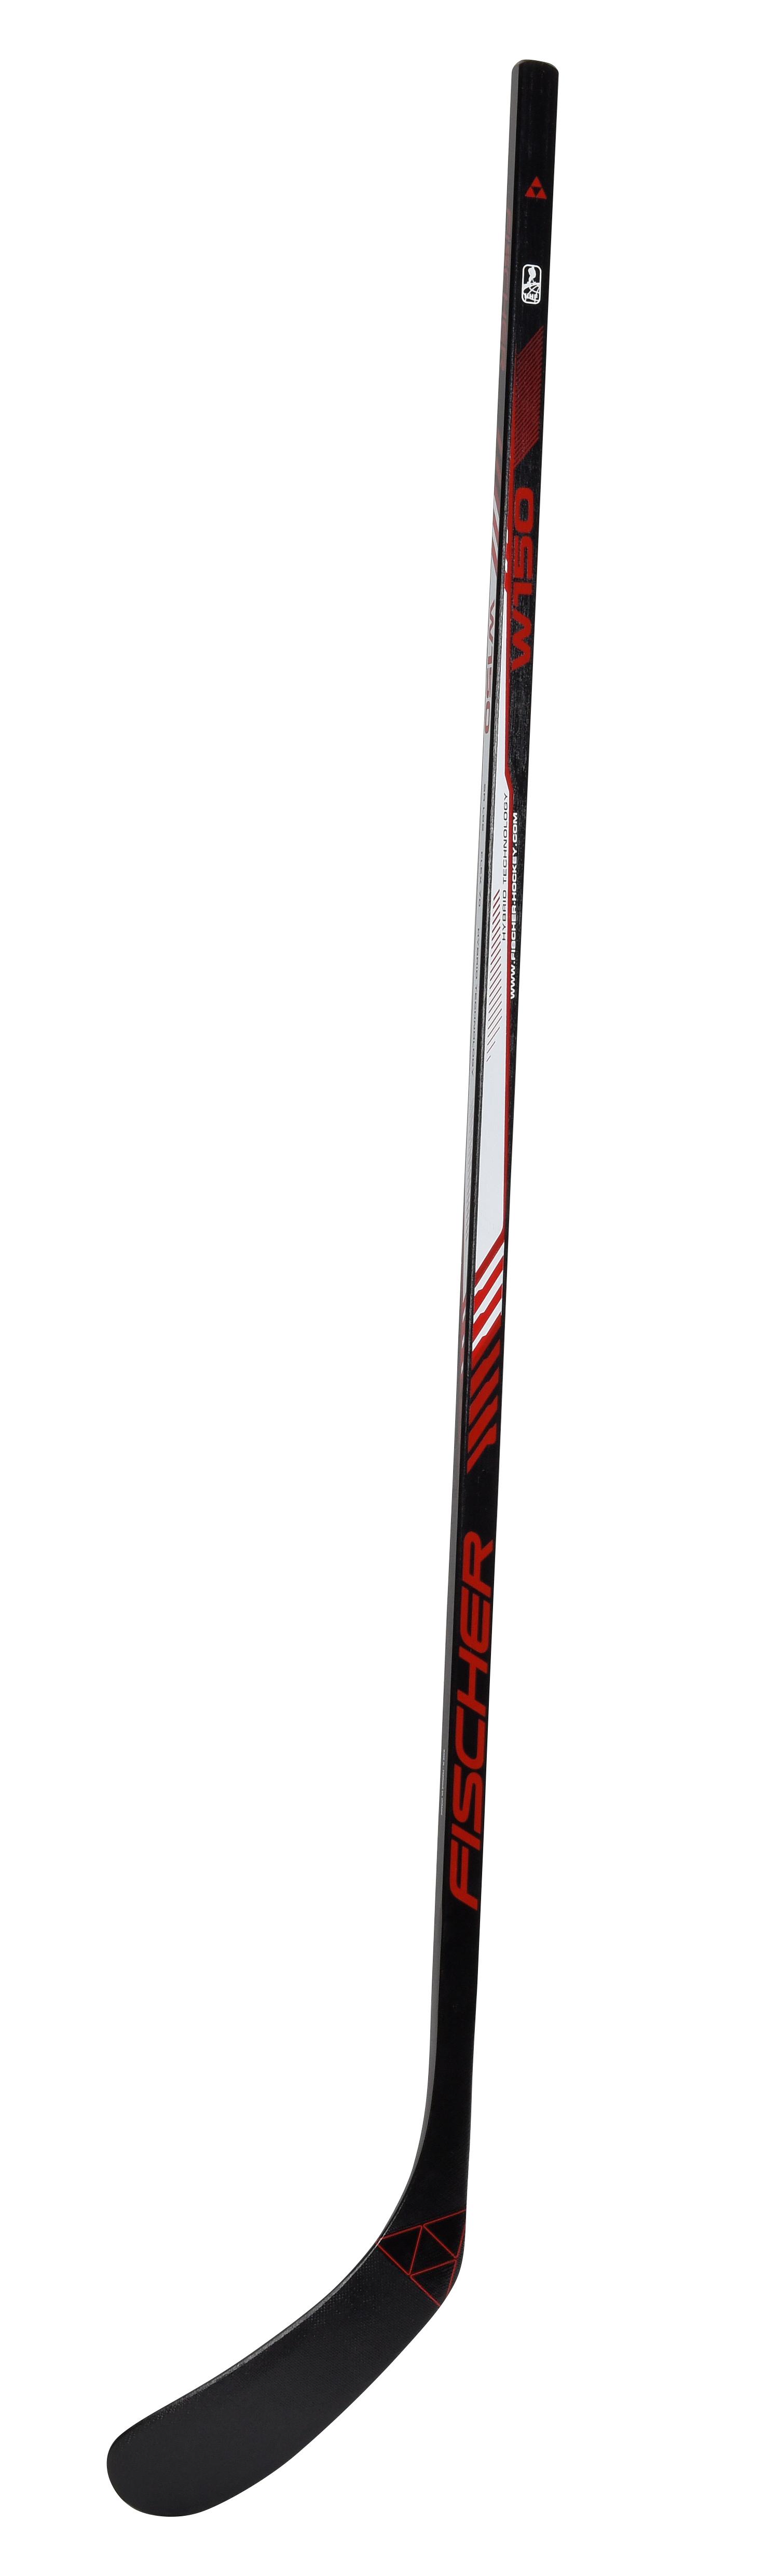 Hokejka FISCHER W150 JR